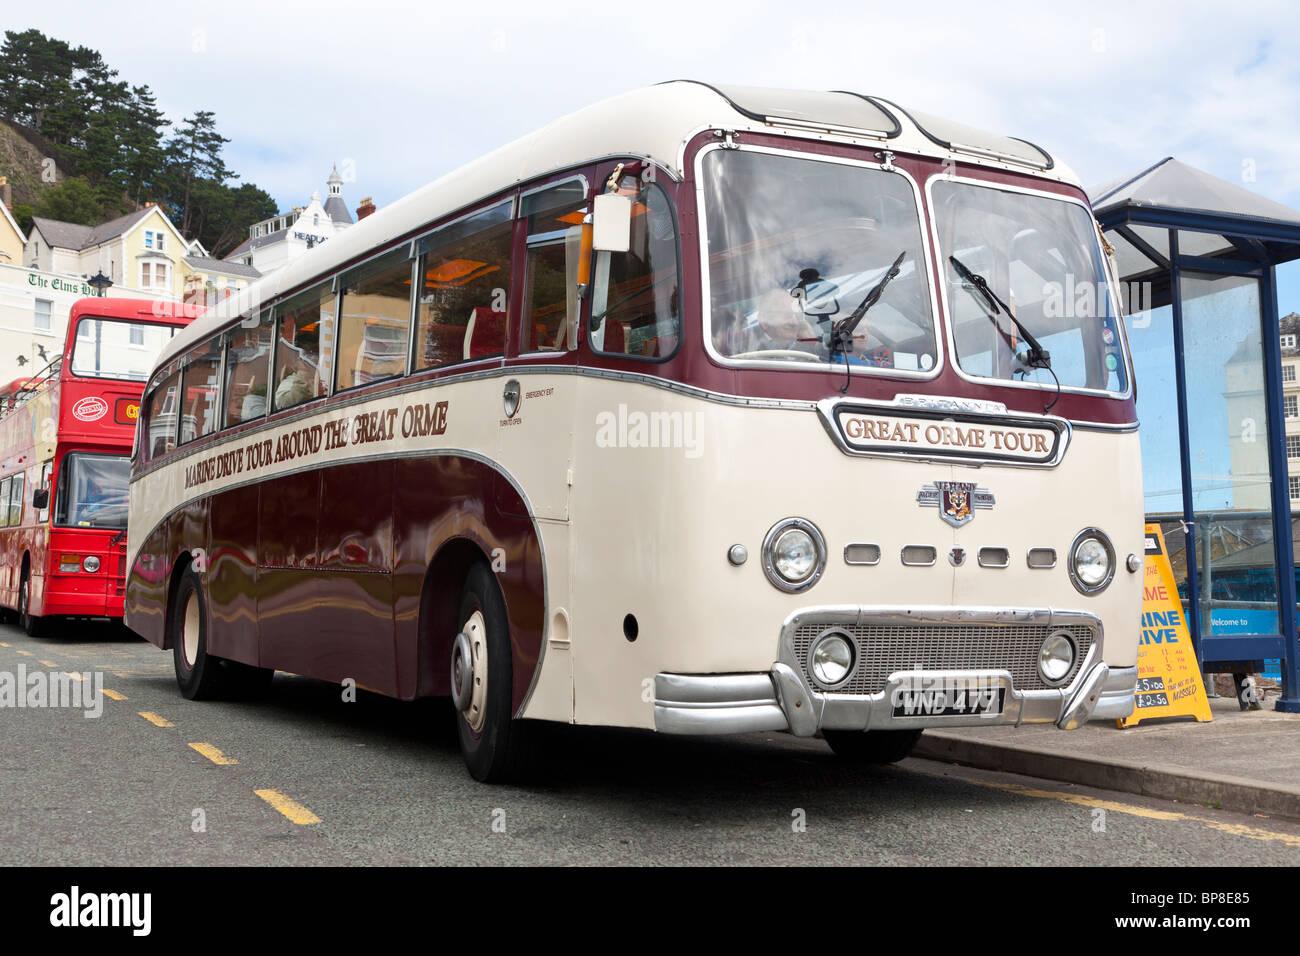 Great Orme Tour, 1950er Jahre Leyland Bus, Llandudno, North Wales Stockbild